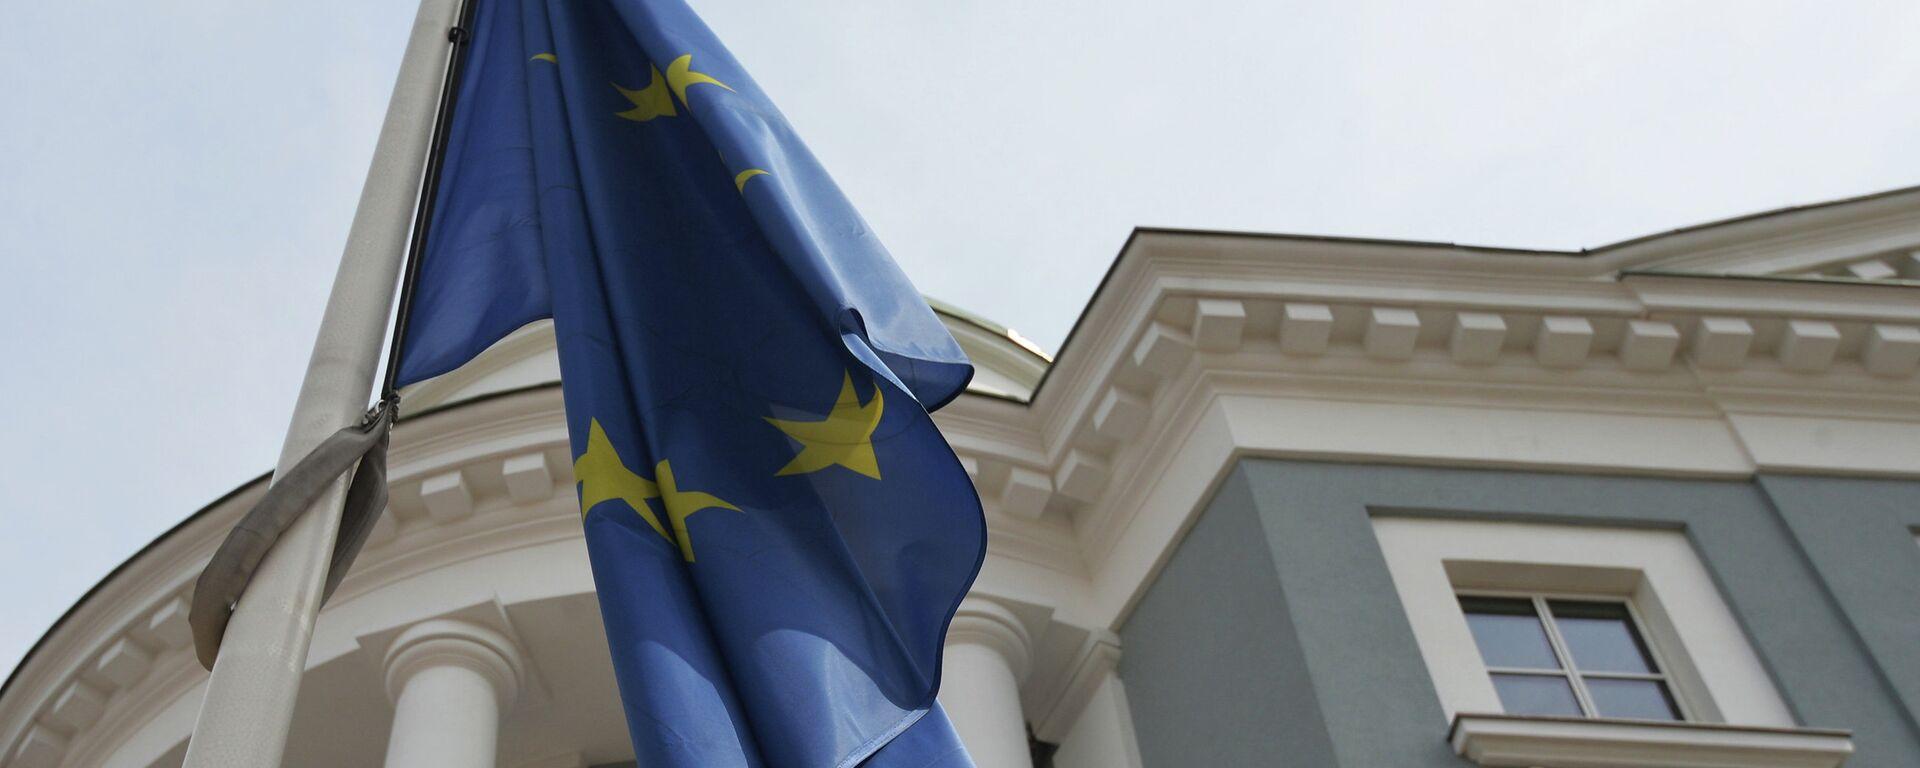 Флаг Европейского Союза, архивное фото. - Sputnik Тоҷикистон, 1920, 25.06.2021